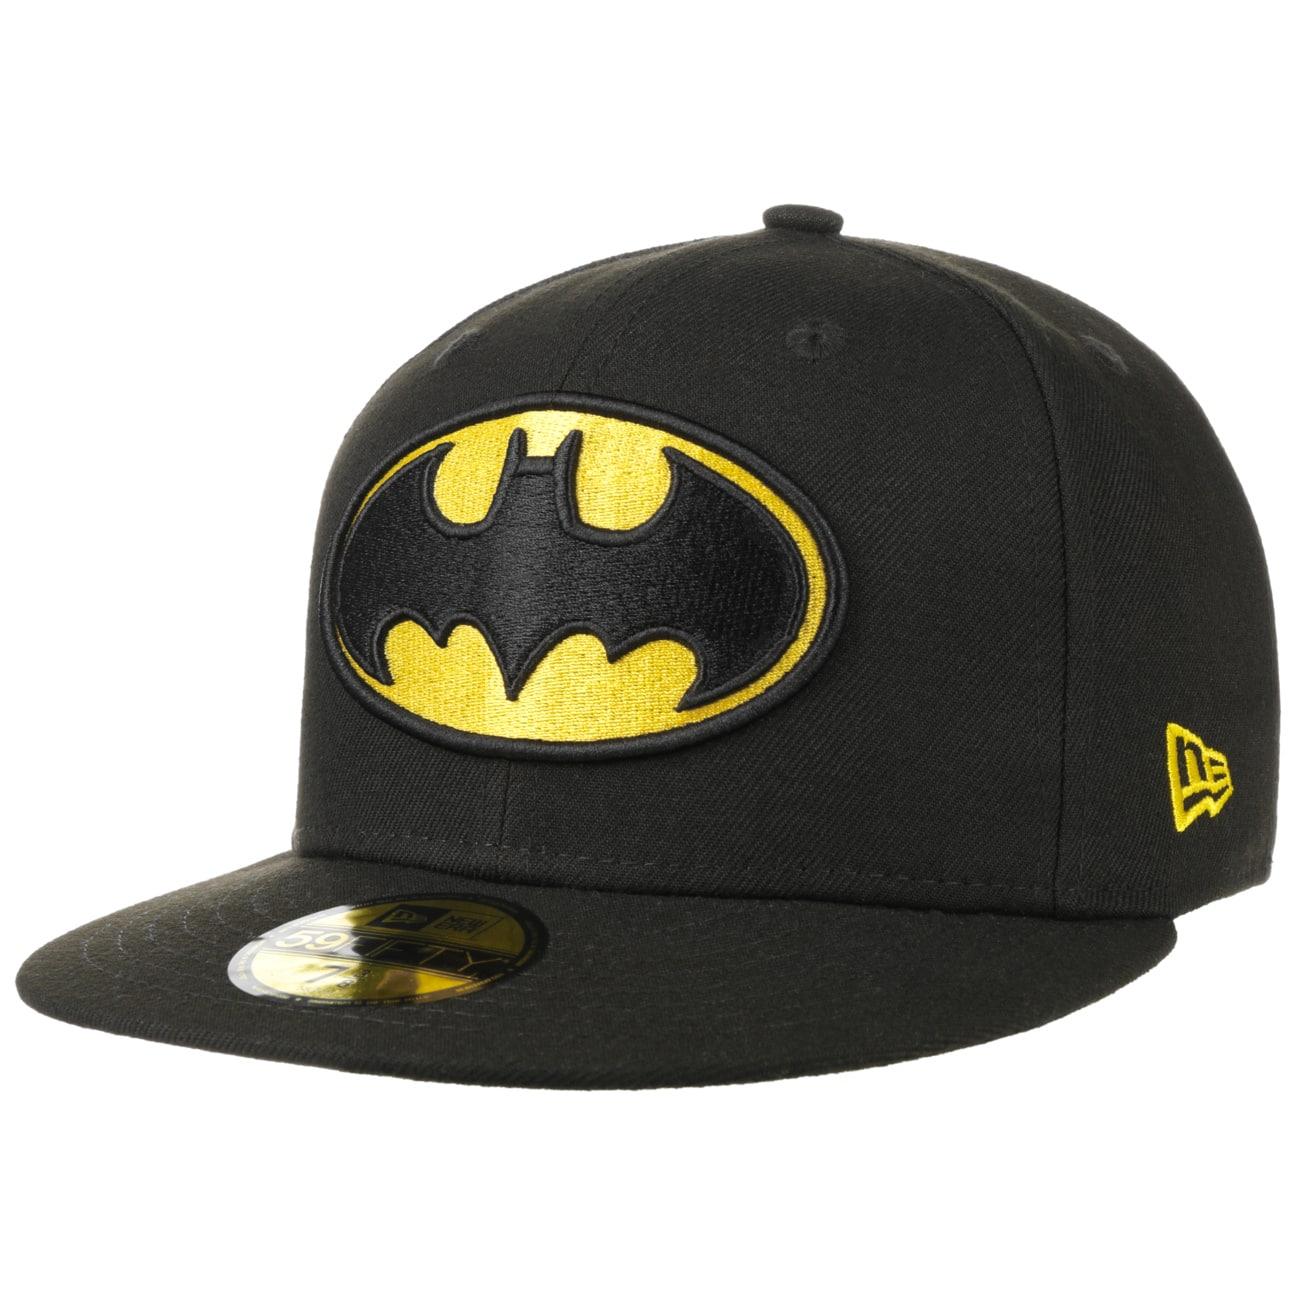 59Fifty Batman Cap by New Era casquettes baseball